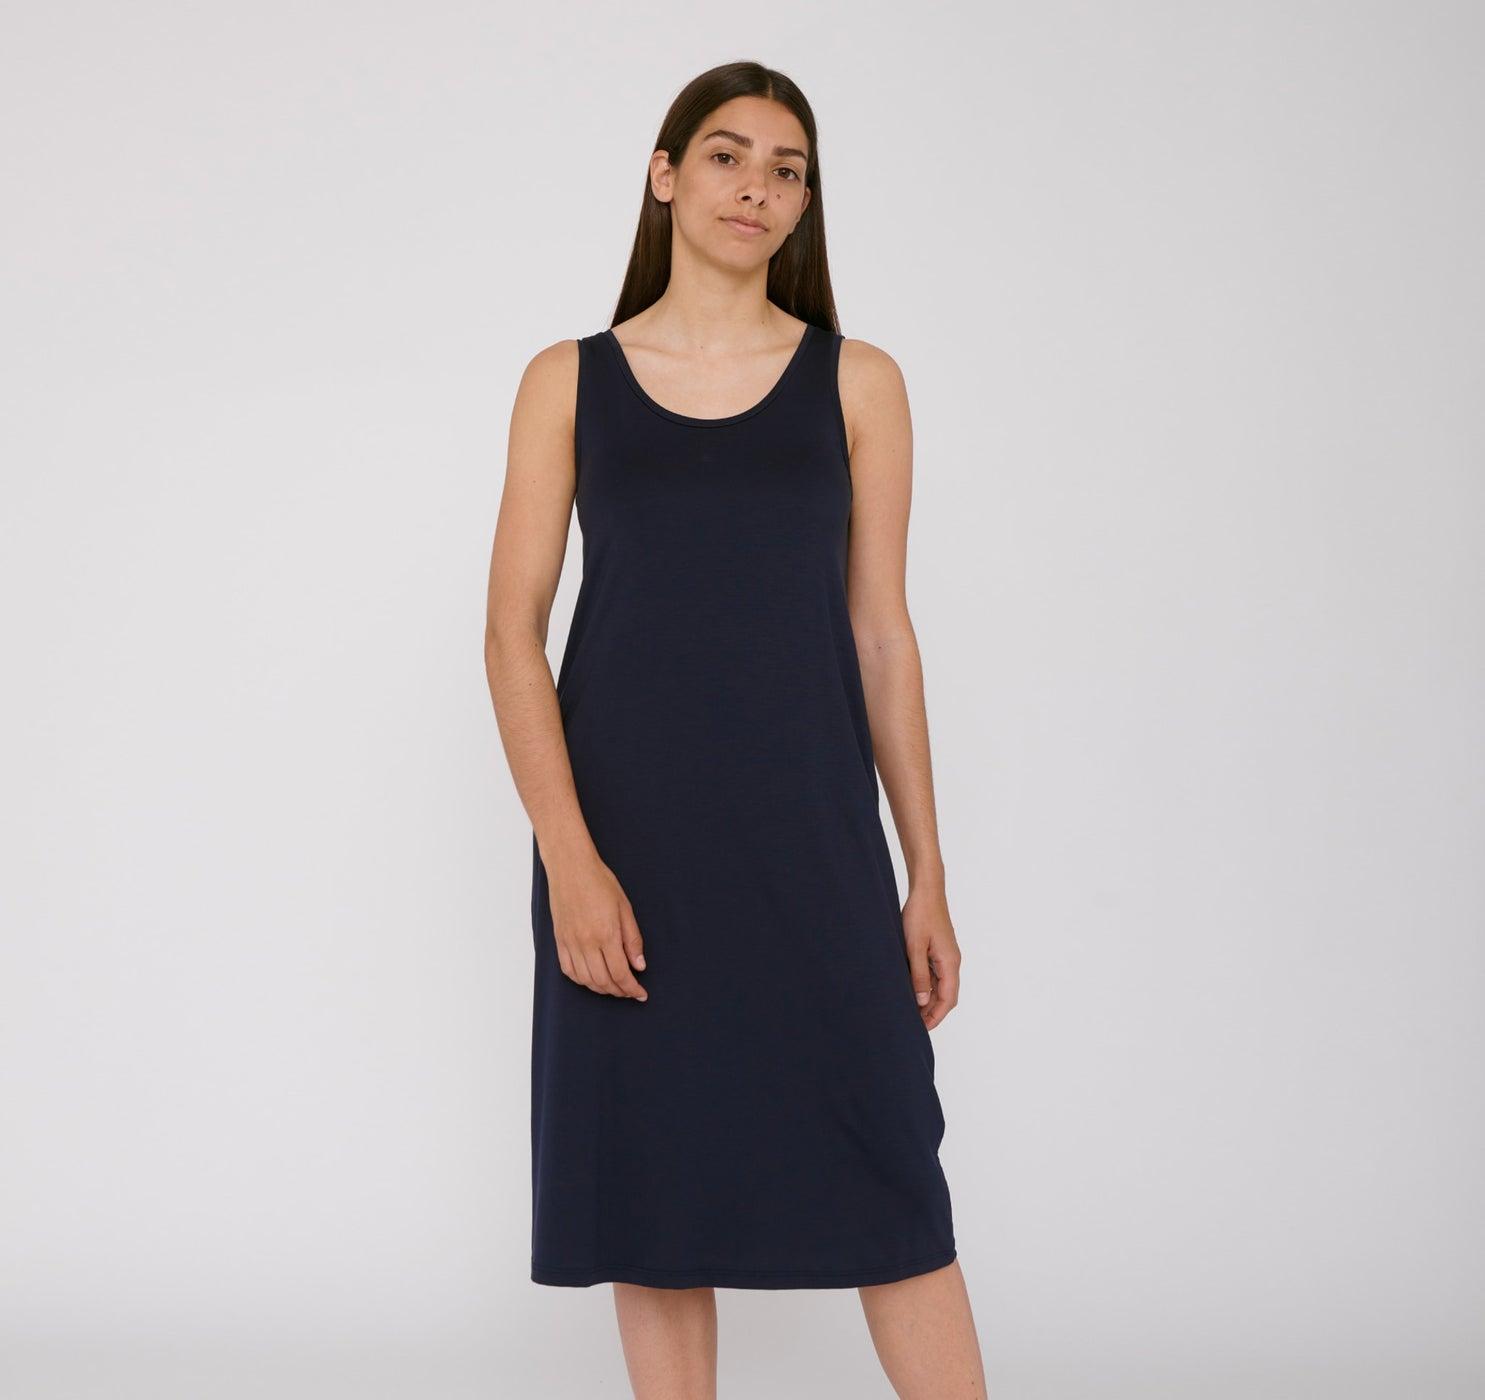 Organic Basics TENCEL™ Lite Dress